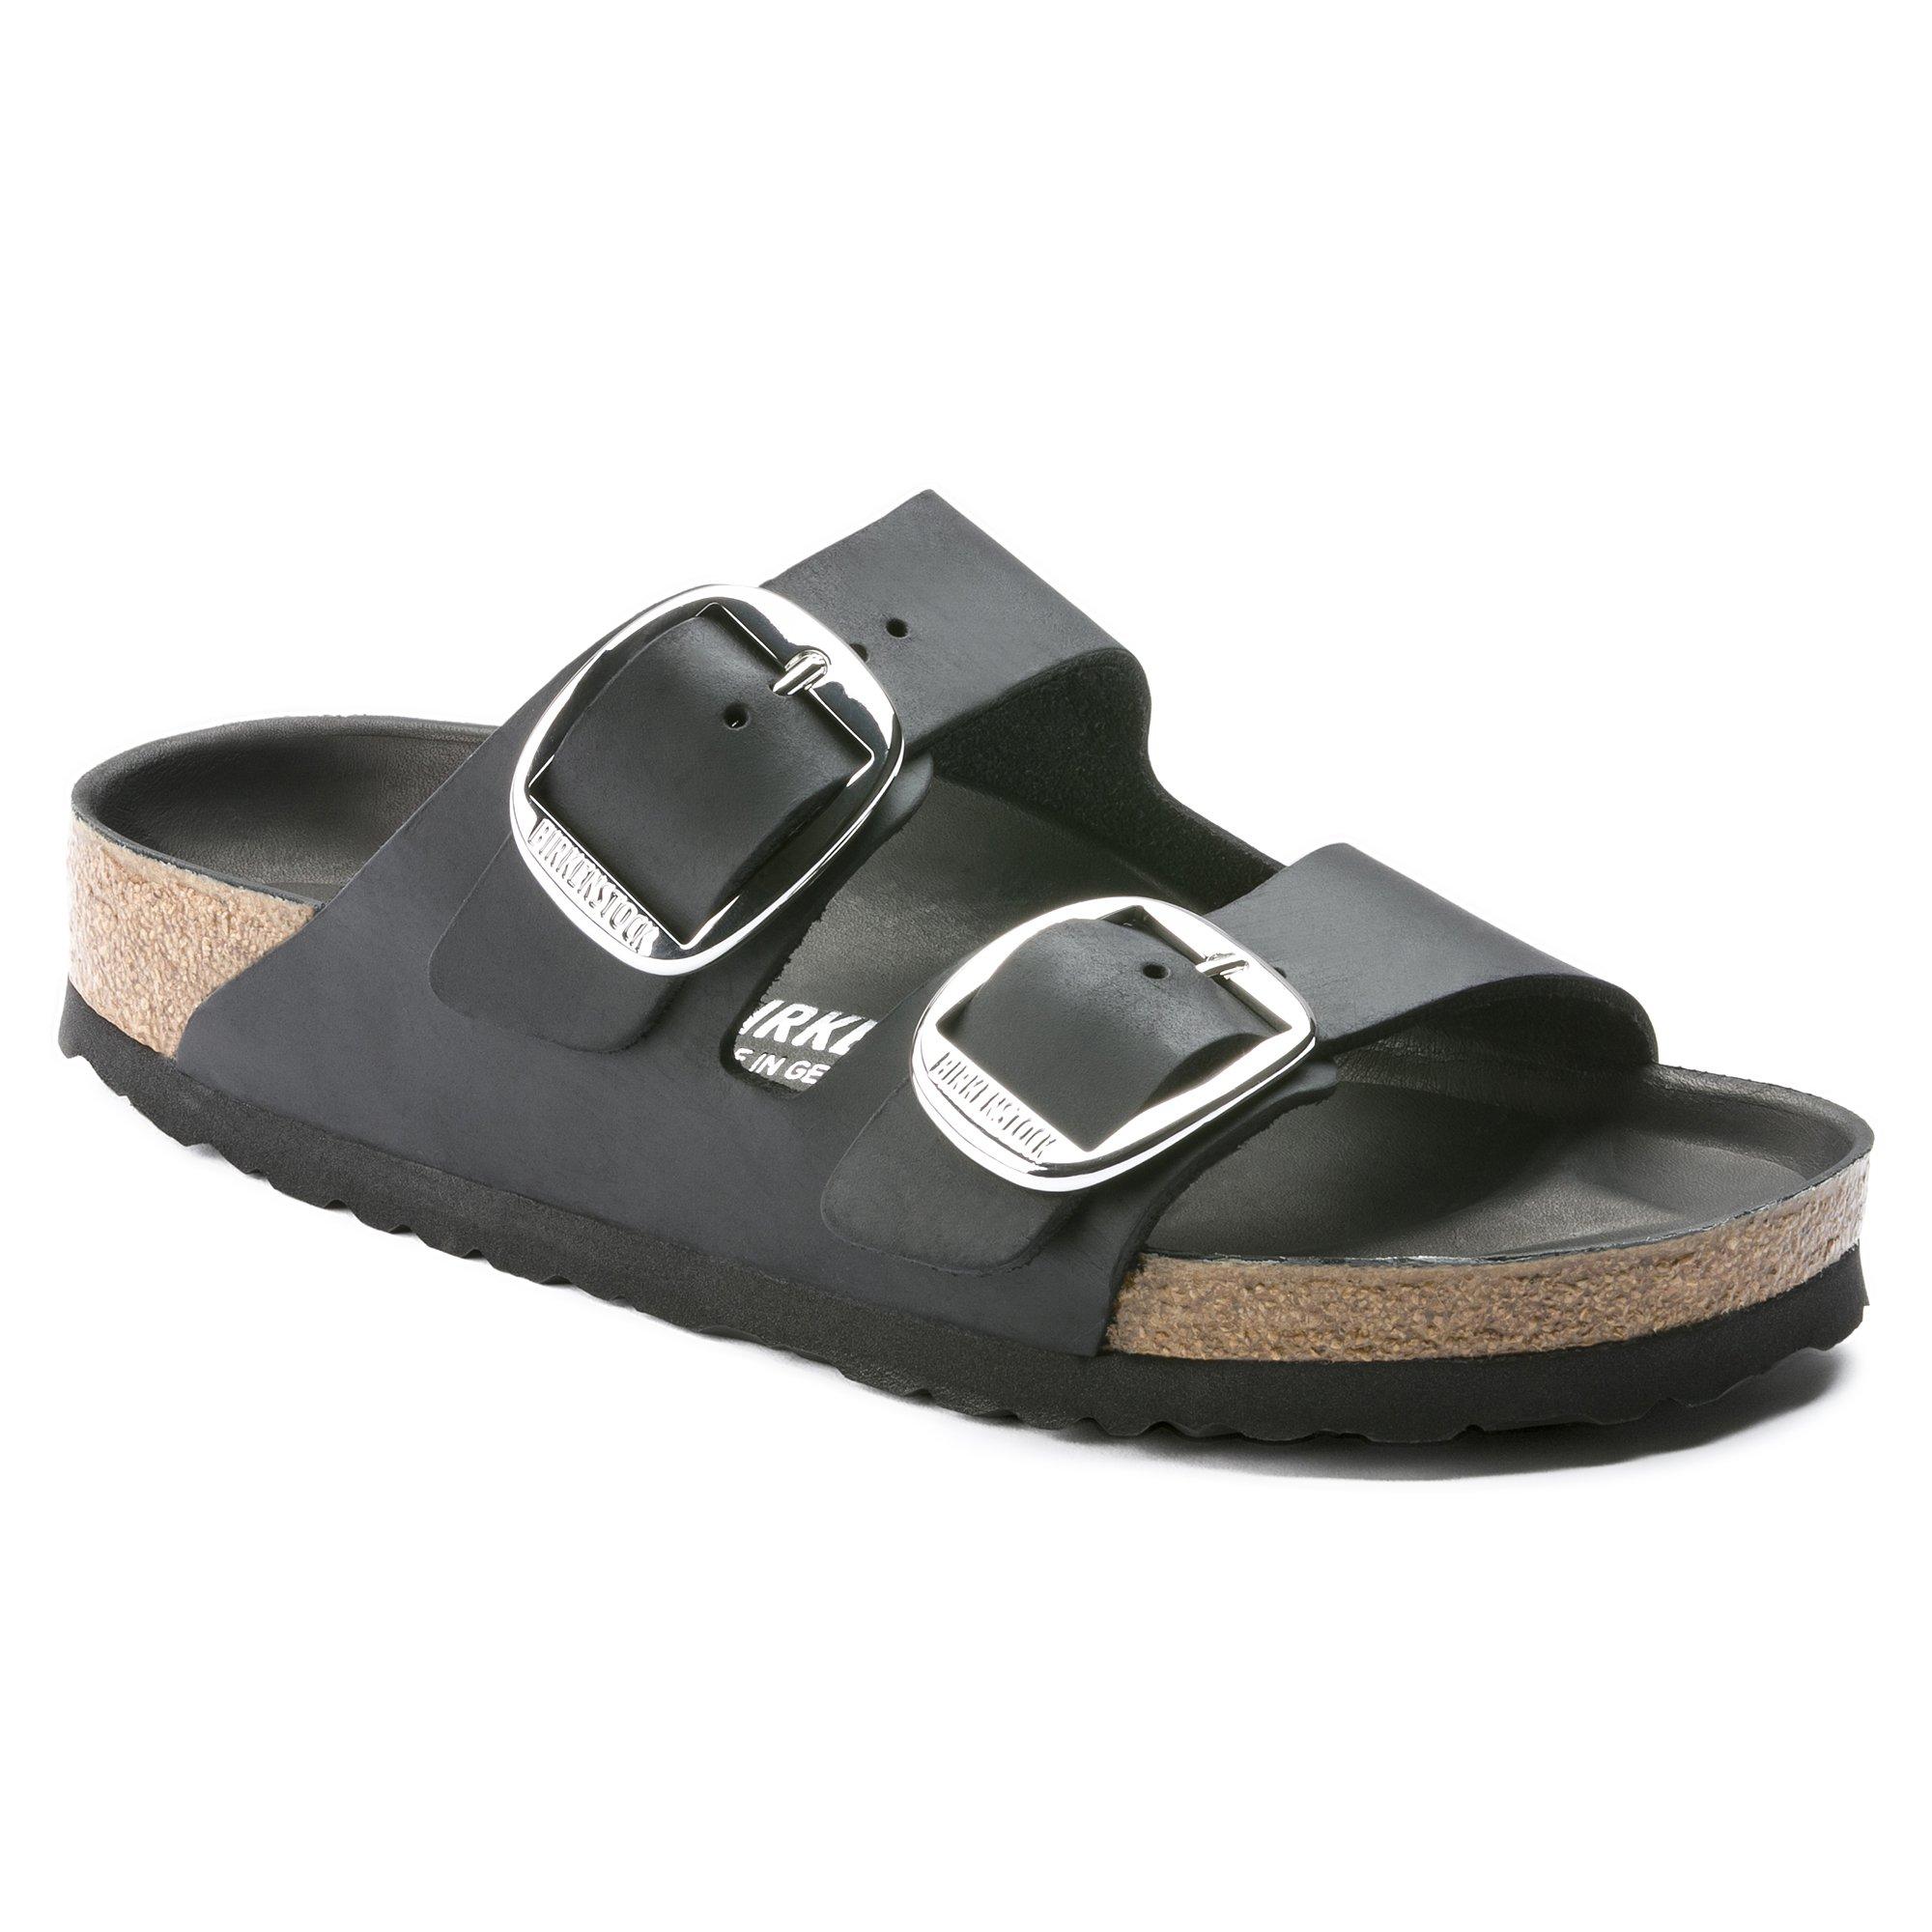 Birkenstock Arizona Big Buckle sandal, black, 37